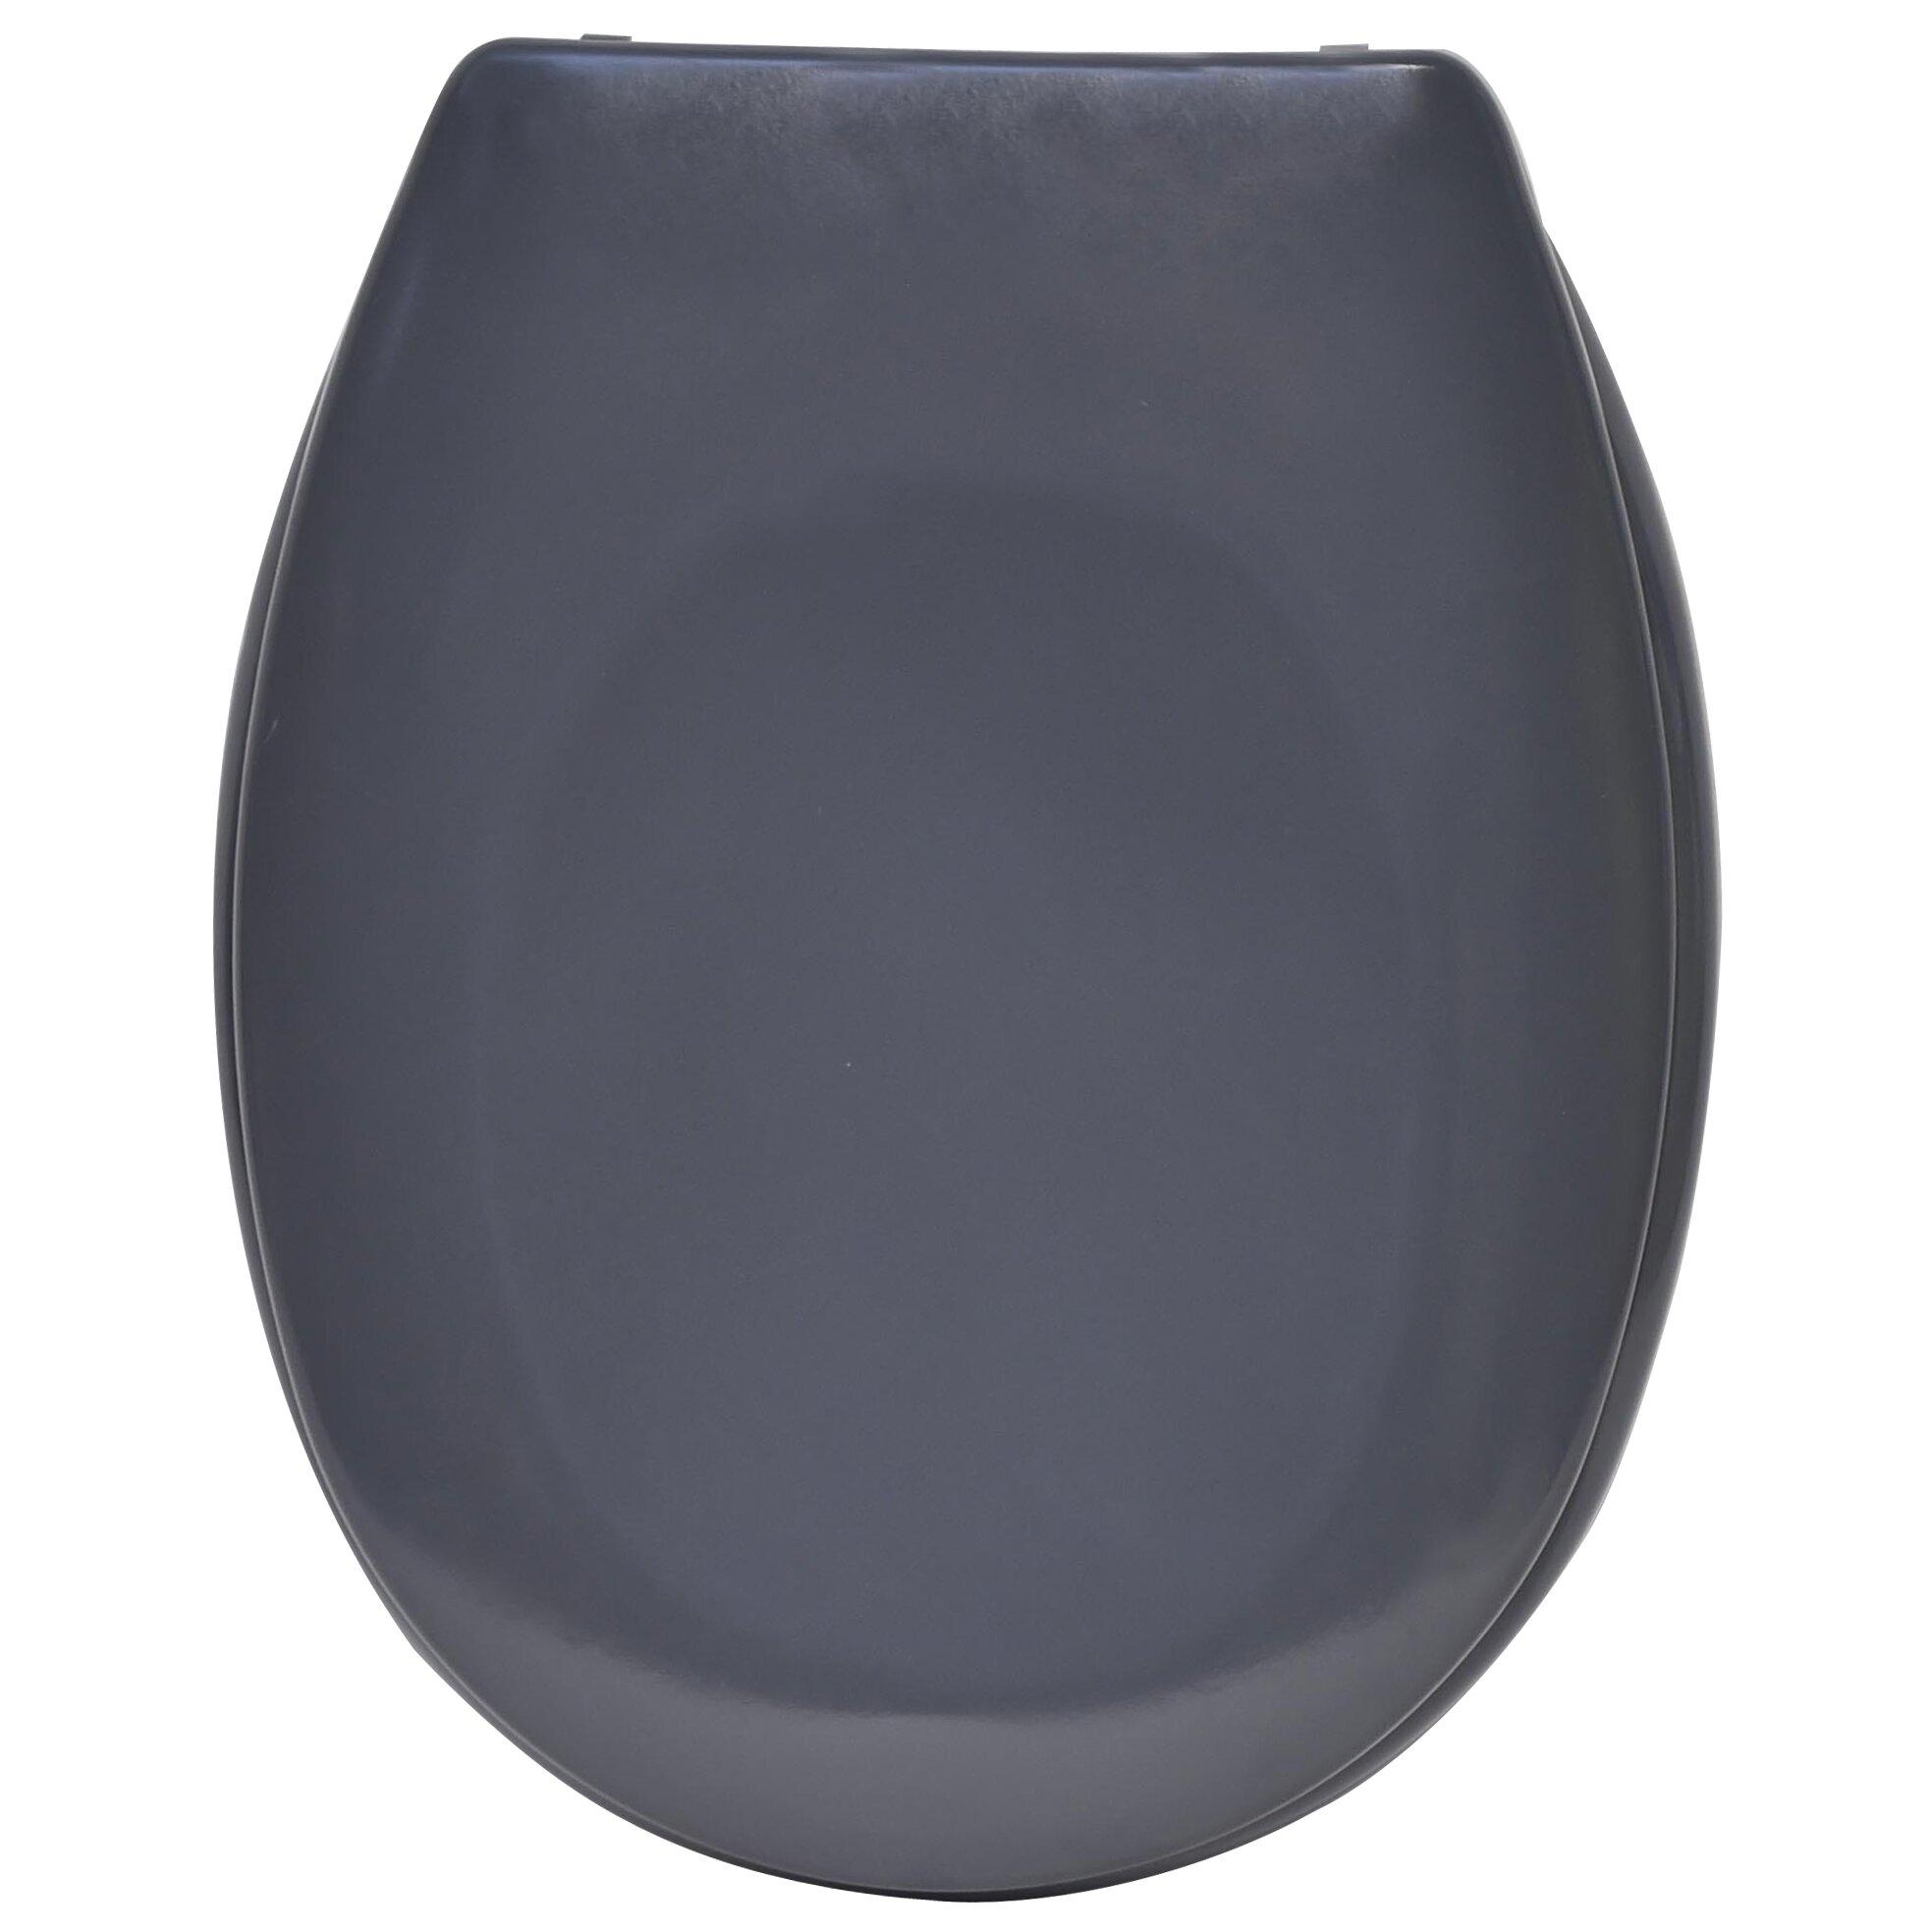 Evideco Slow Close Quiet Elongated Toilet Seat Wayfair